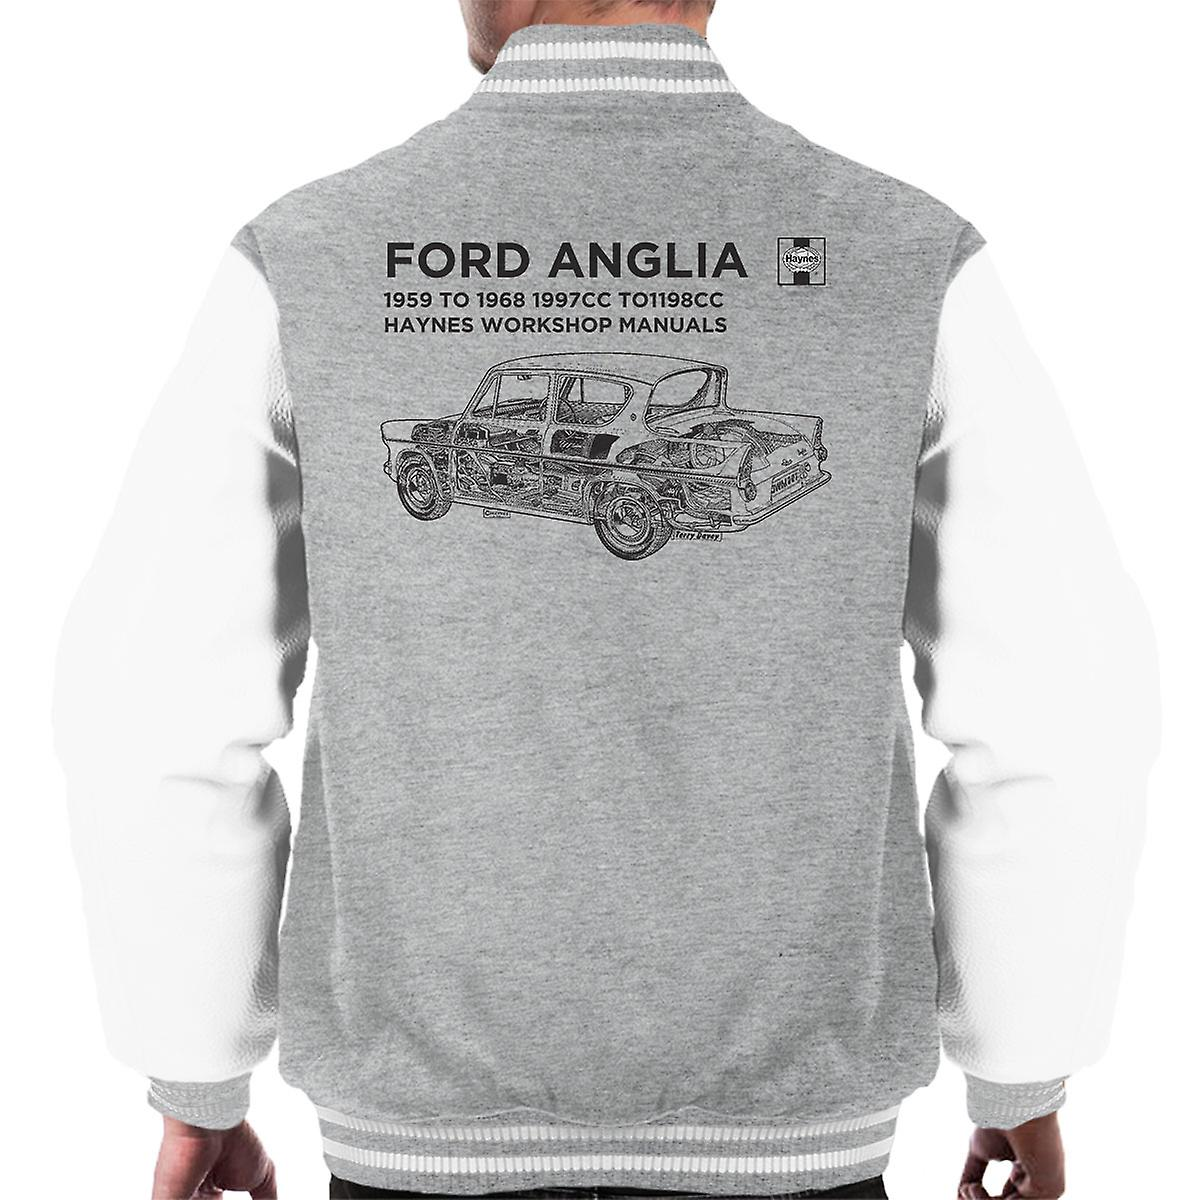 Haynes Workshop Manual 0001 Ford Anglia Black mannen Varsity Jacket